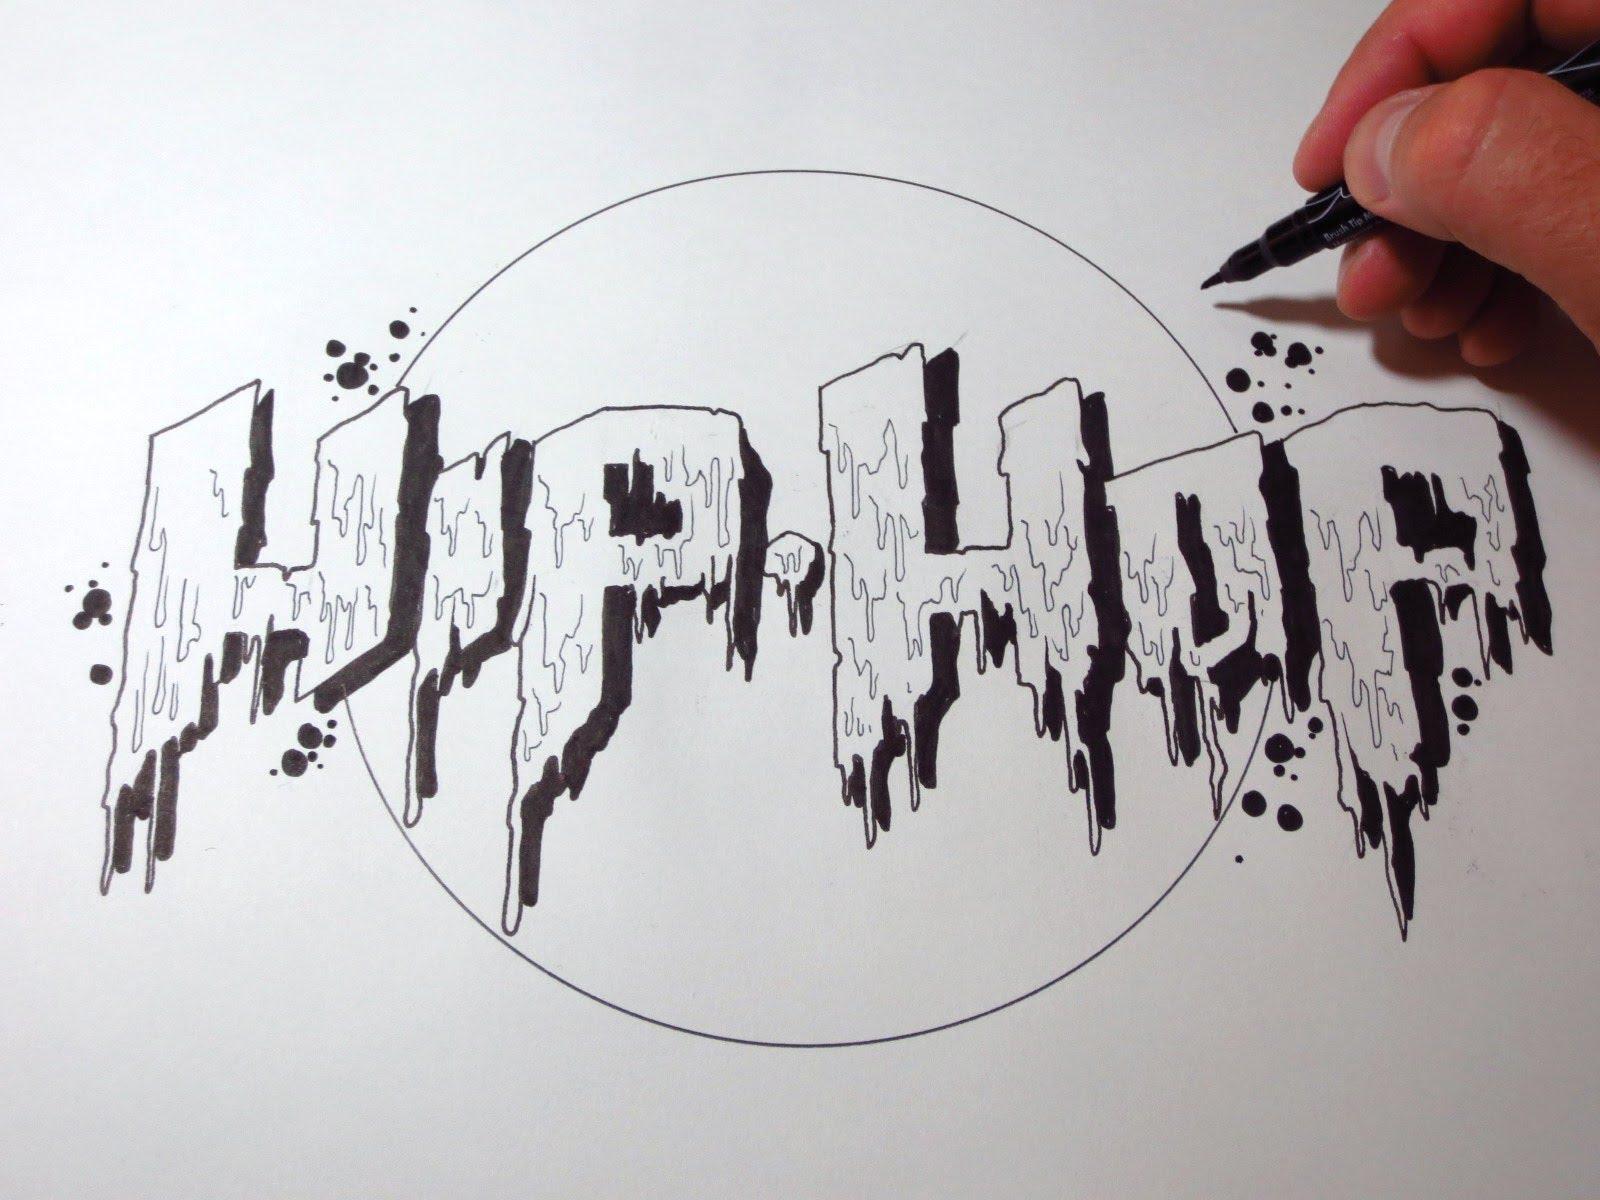 16 graffiti dripping bubble font images dripping graffiti letters